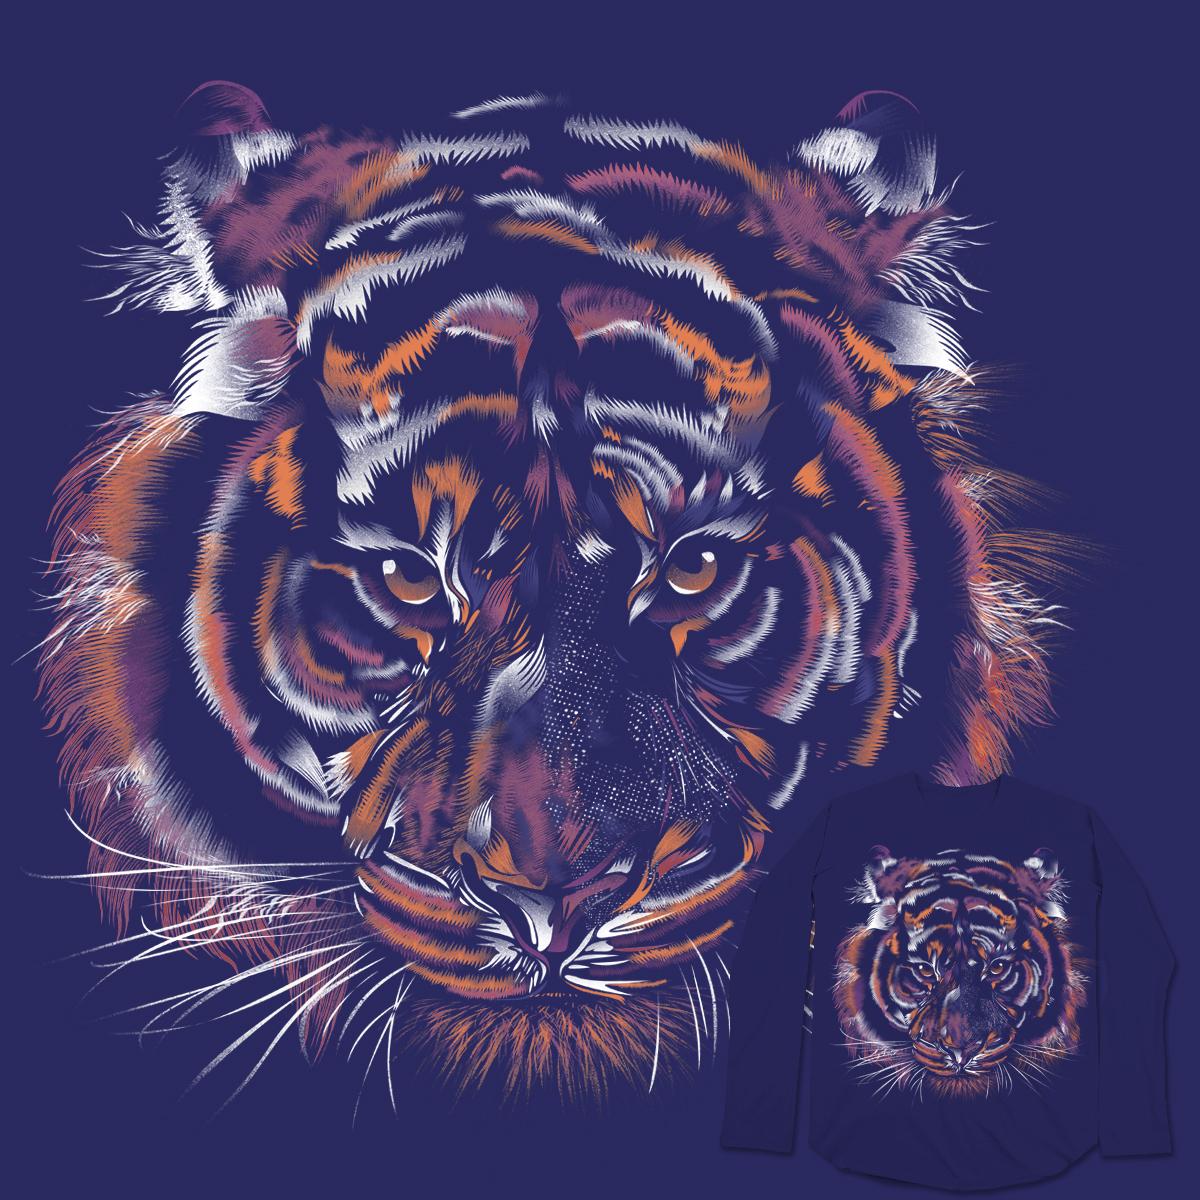 Wild Tiger by dandingeroz on Threadless